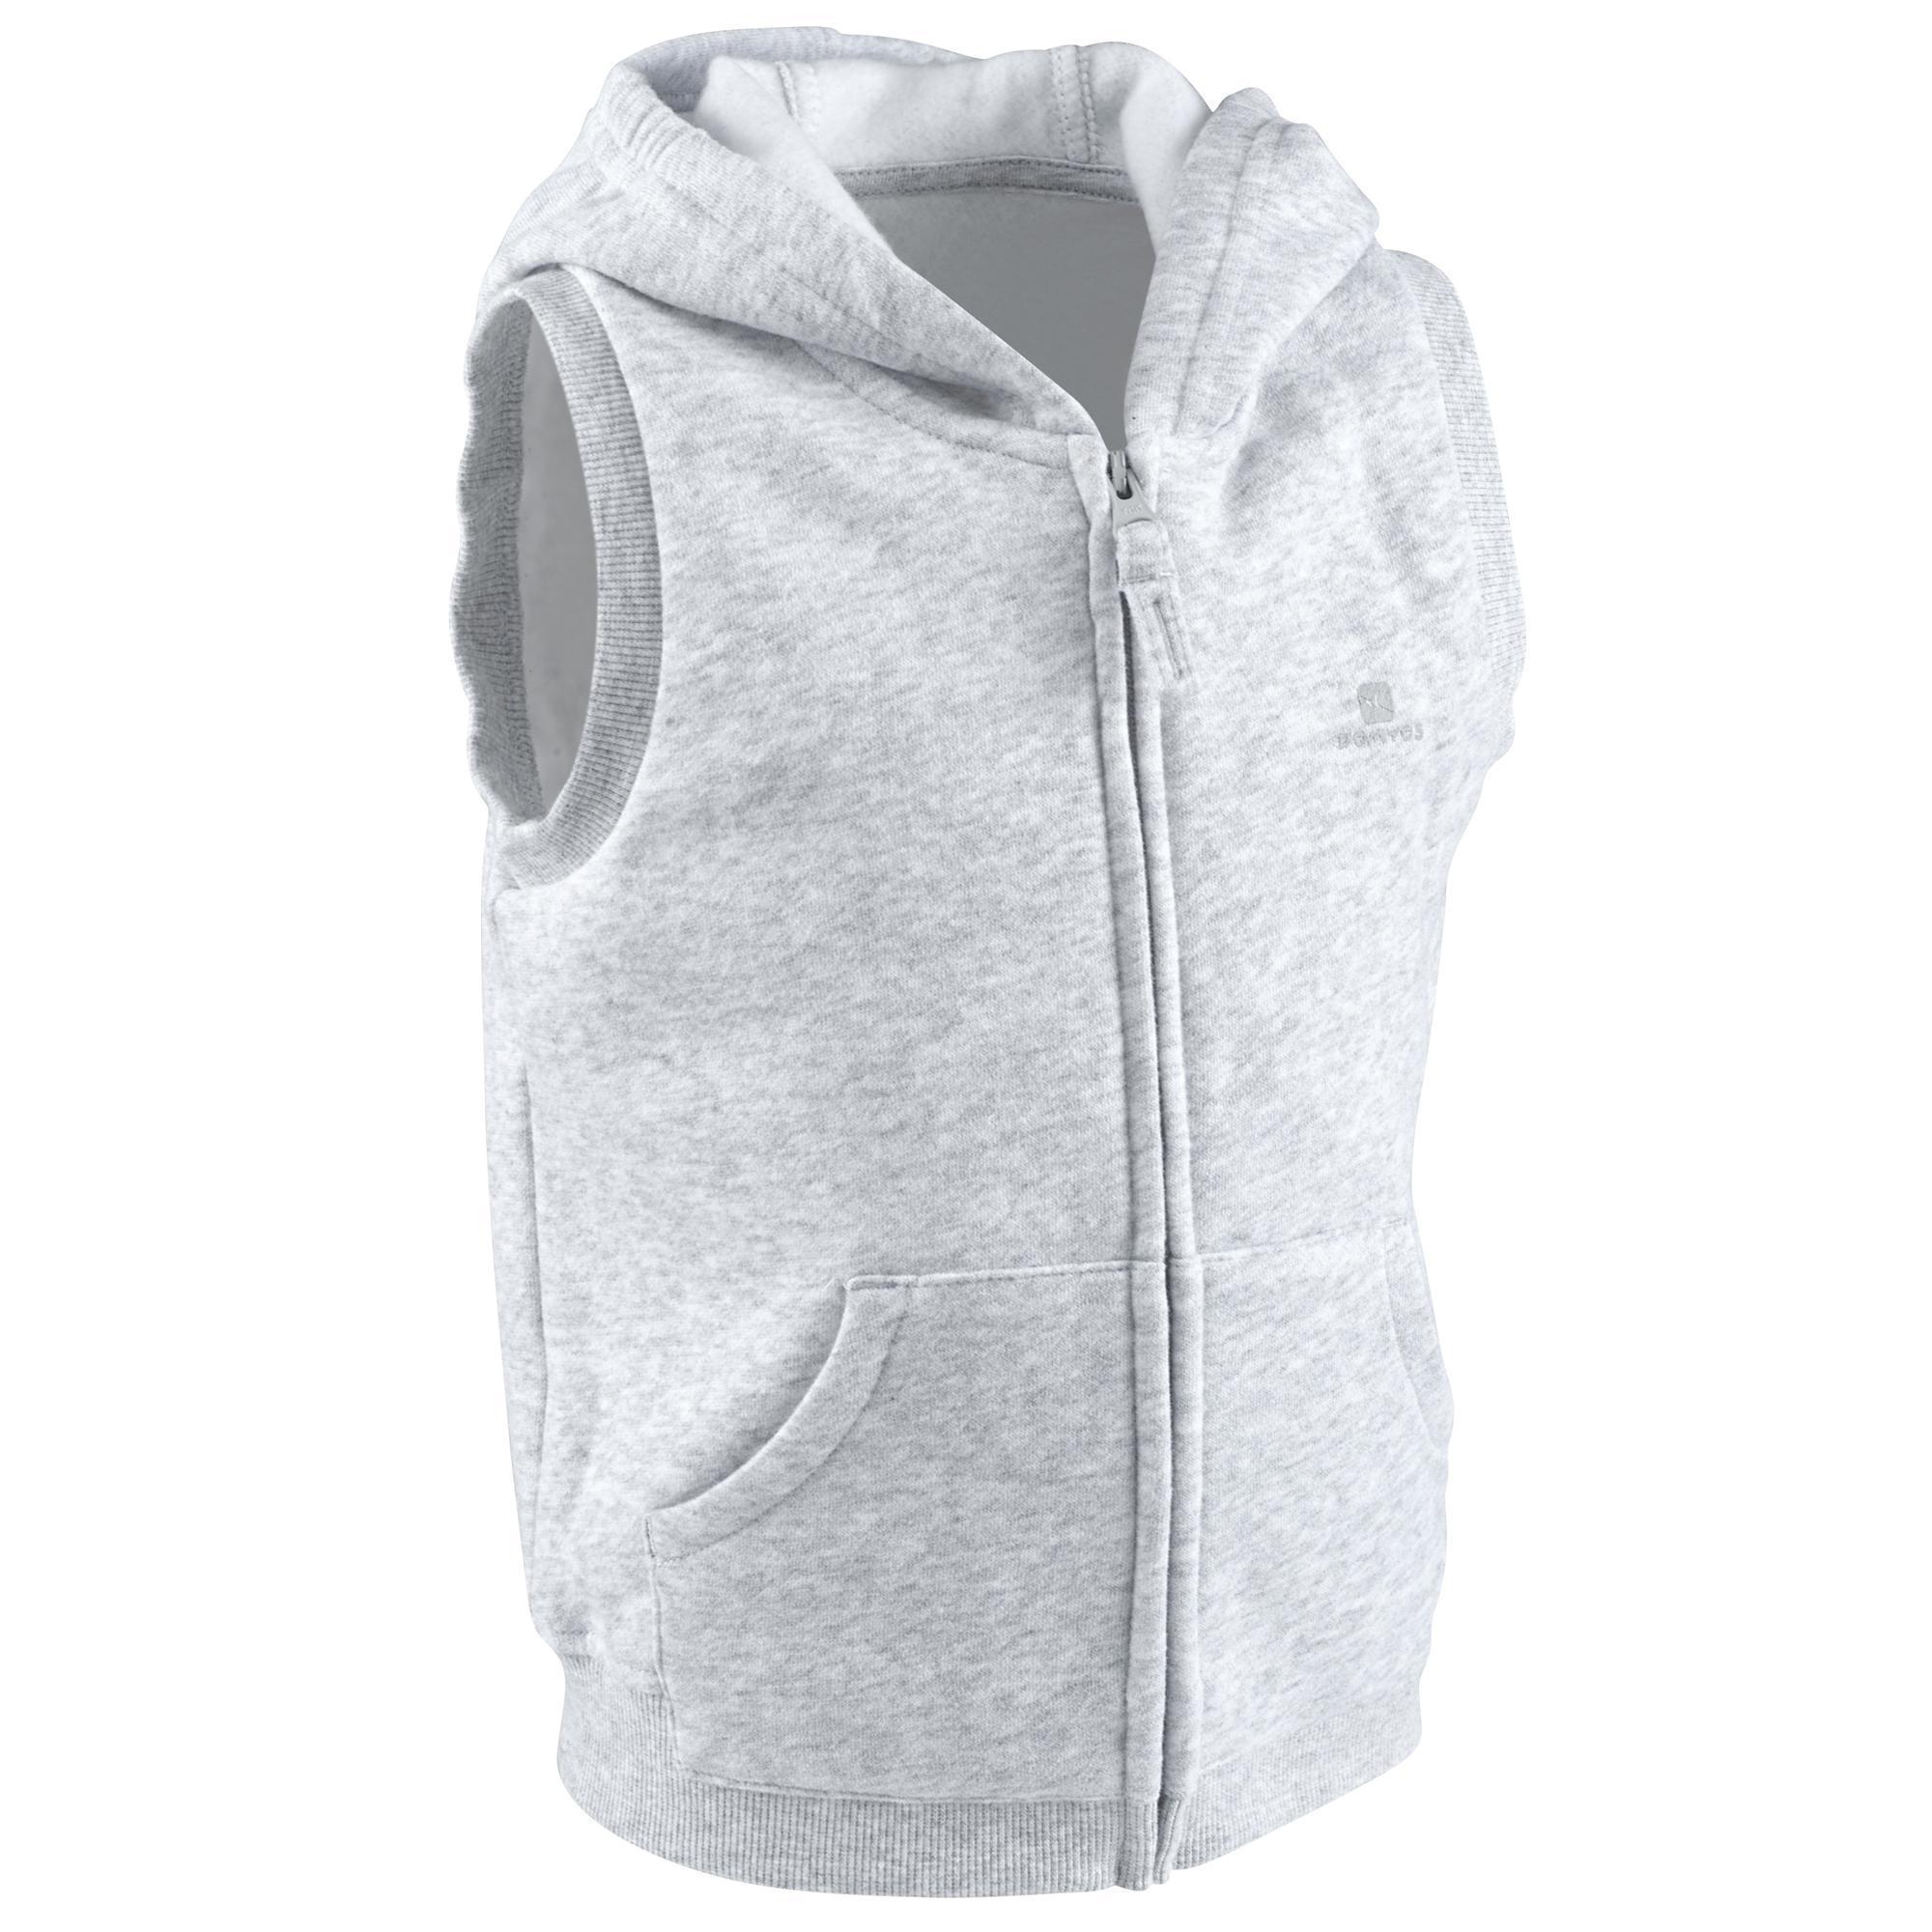 Veste chaude sans manches zipp e capuche gym baby gris - Felpa porta bebe decathlon ...